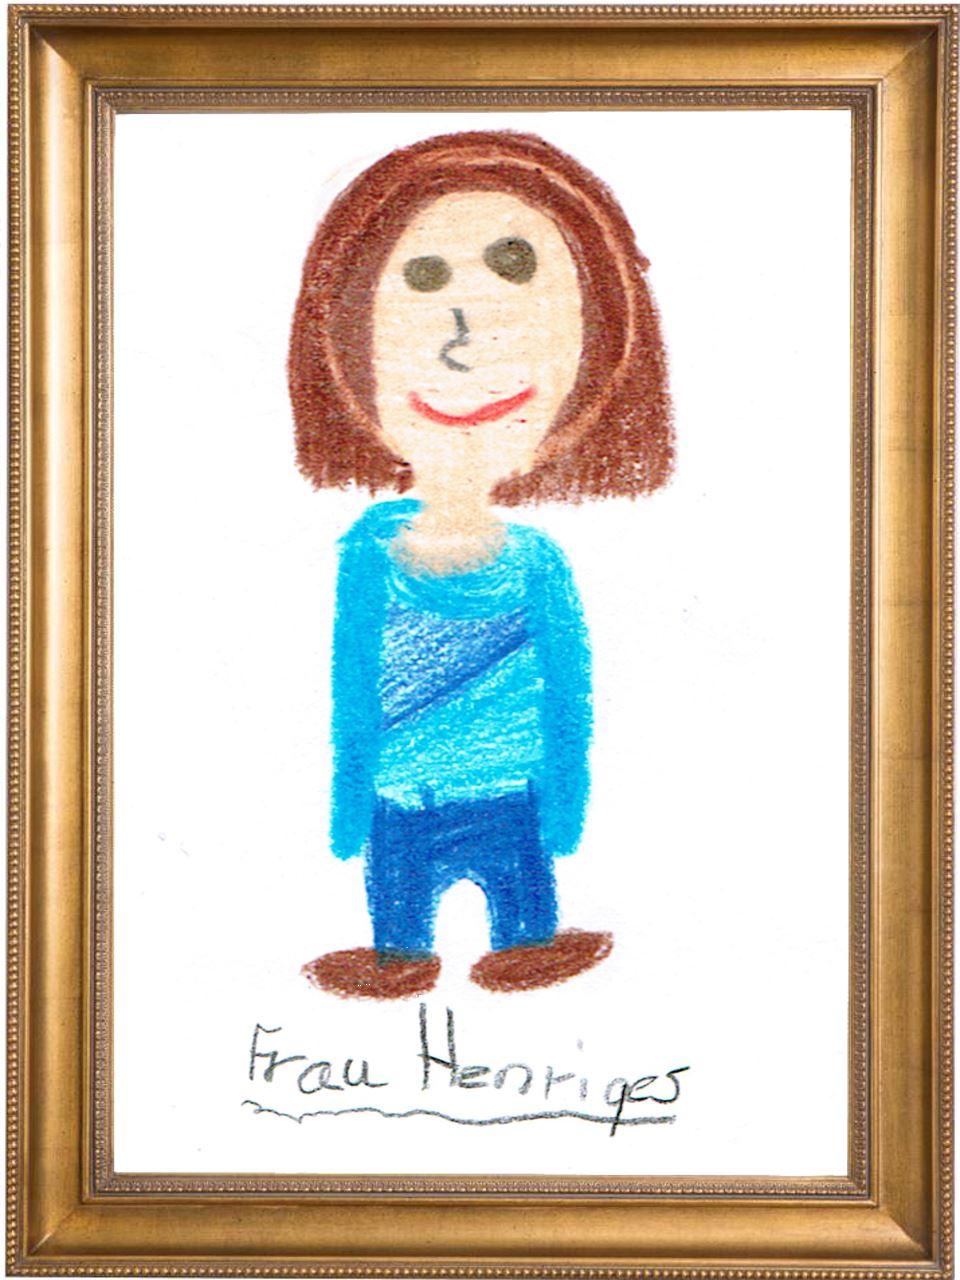 Frau Henriques